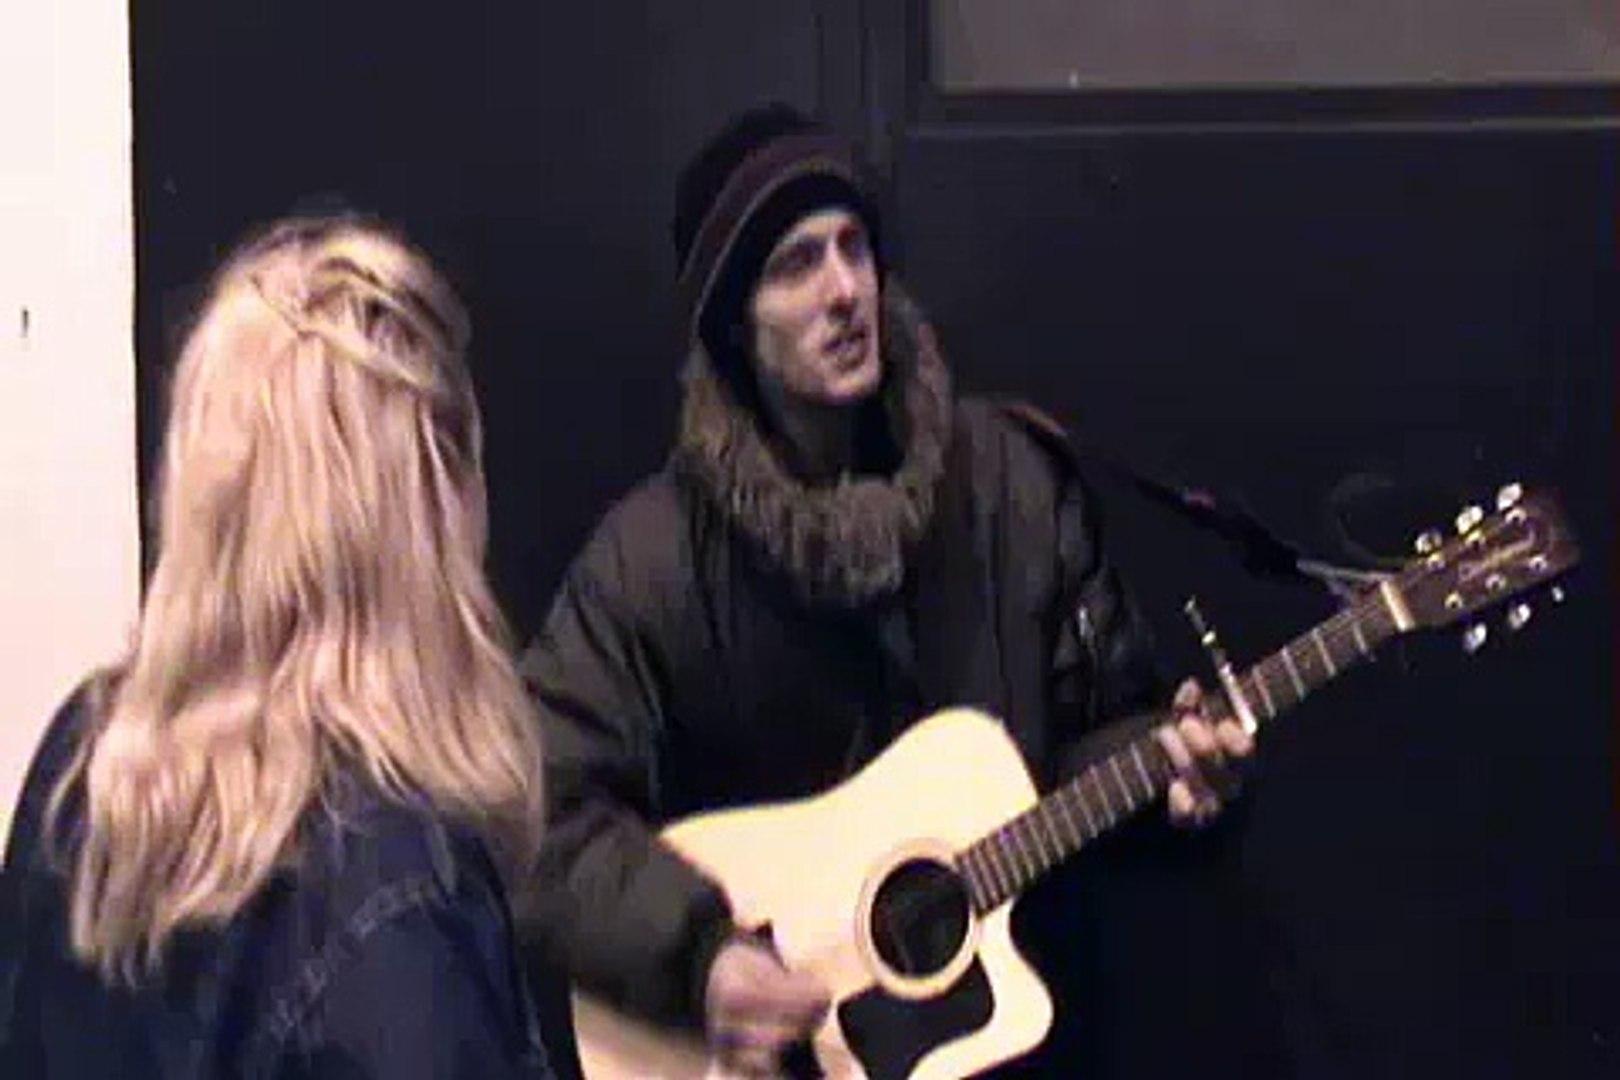 Irish Street Musician: Part 2 - James Blunt